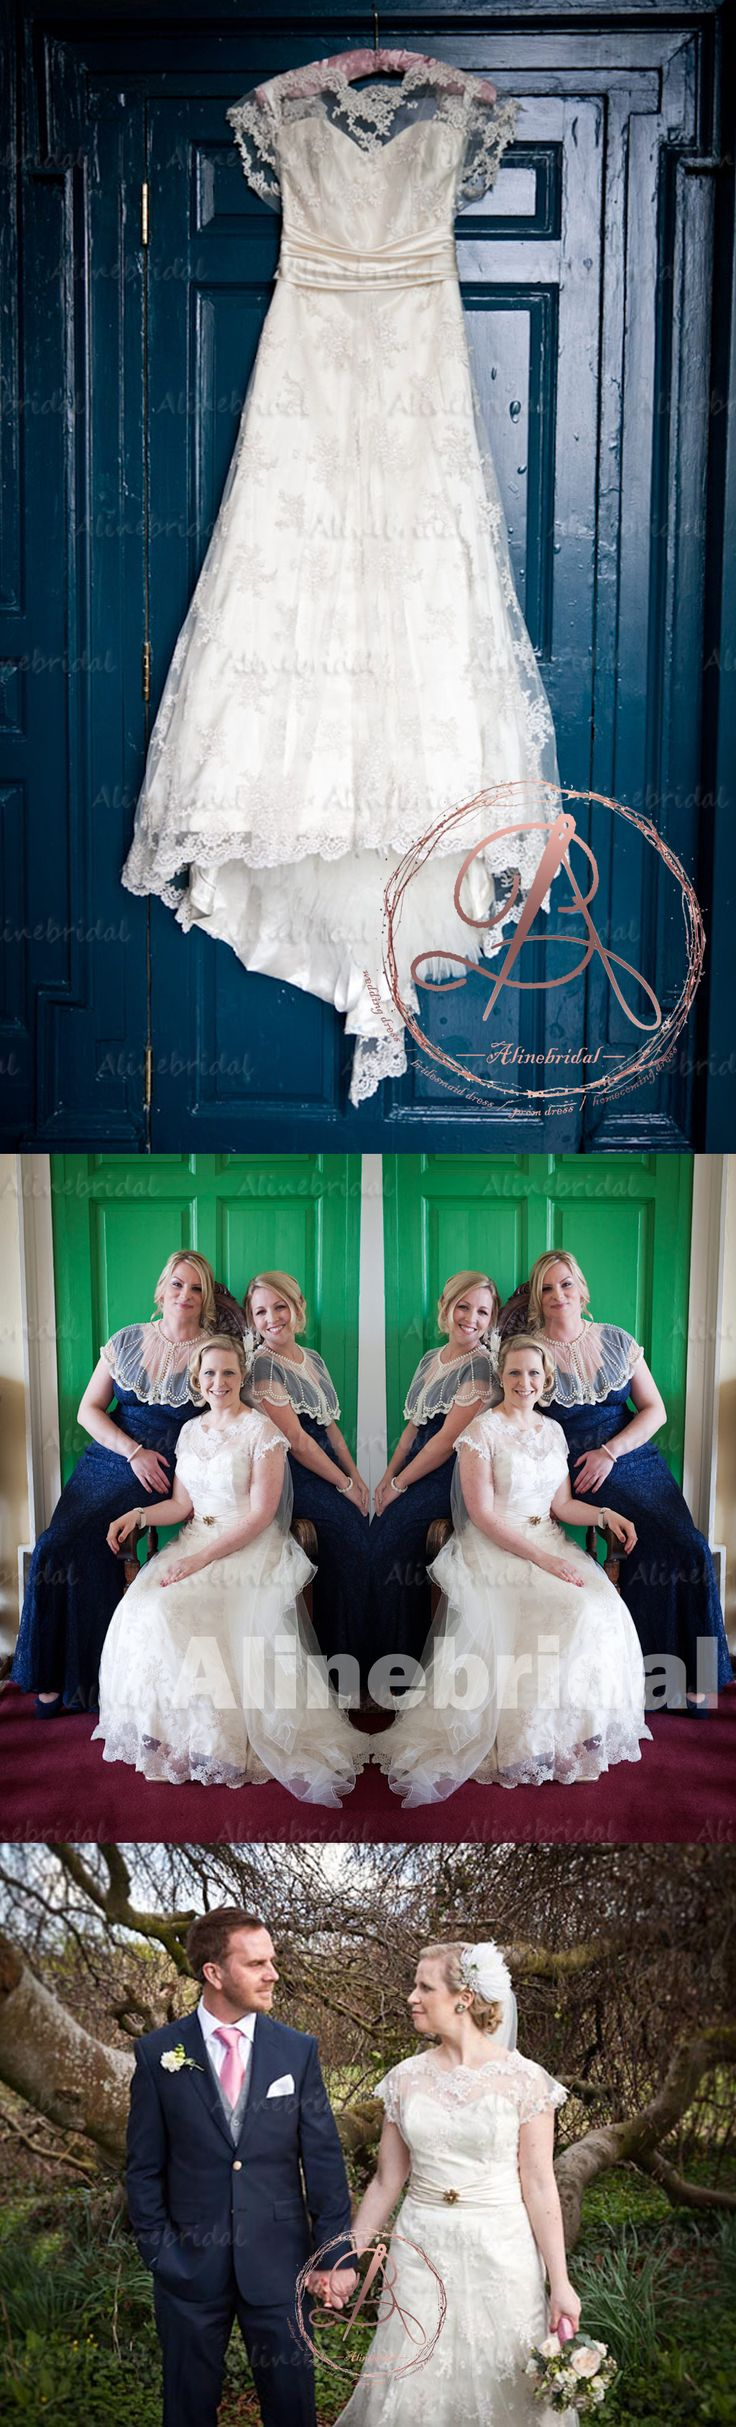 VINTAGE LACE CAP SLEEVE JEWEL NECK SWEETHEART ELEGANT A-LINE STUNNING WEDDING DRESSES, AB1118